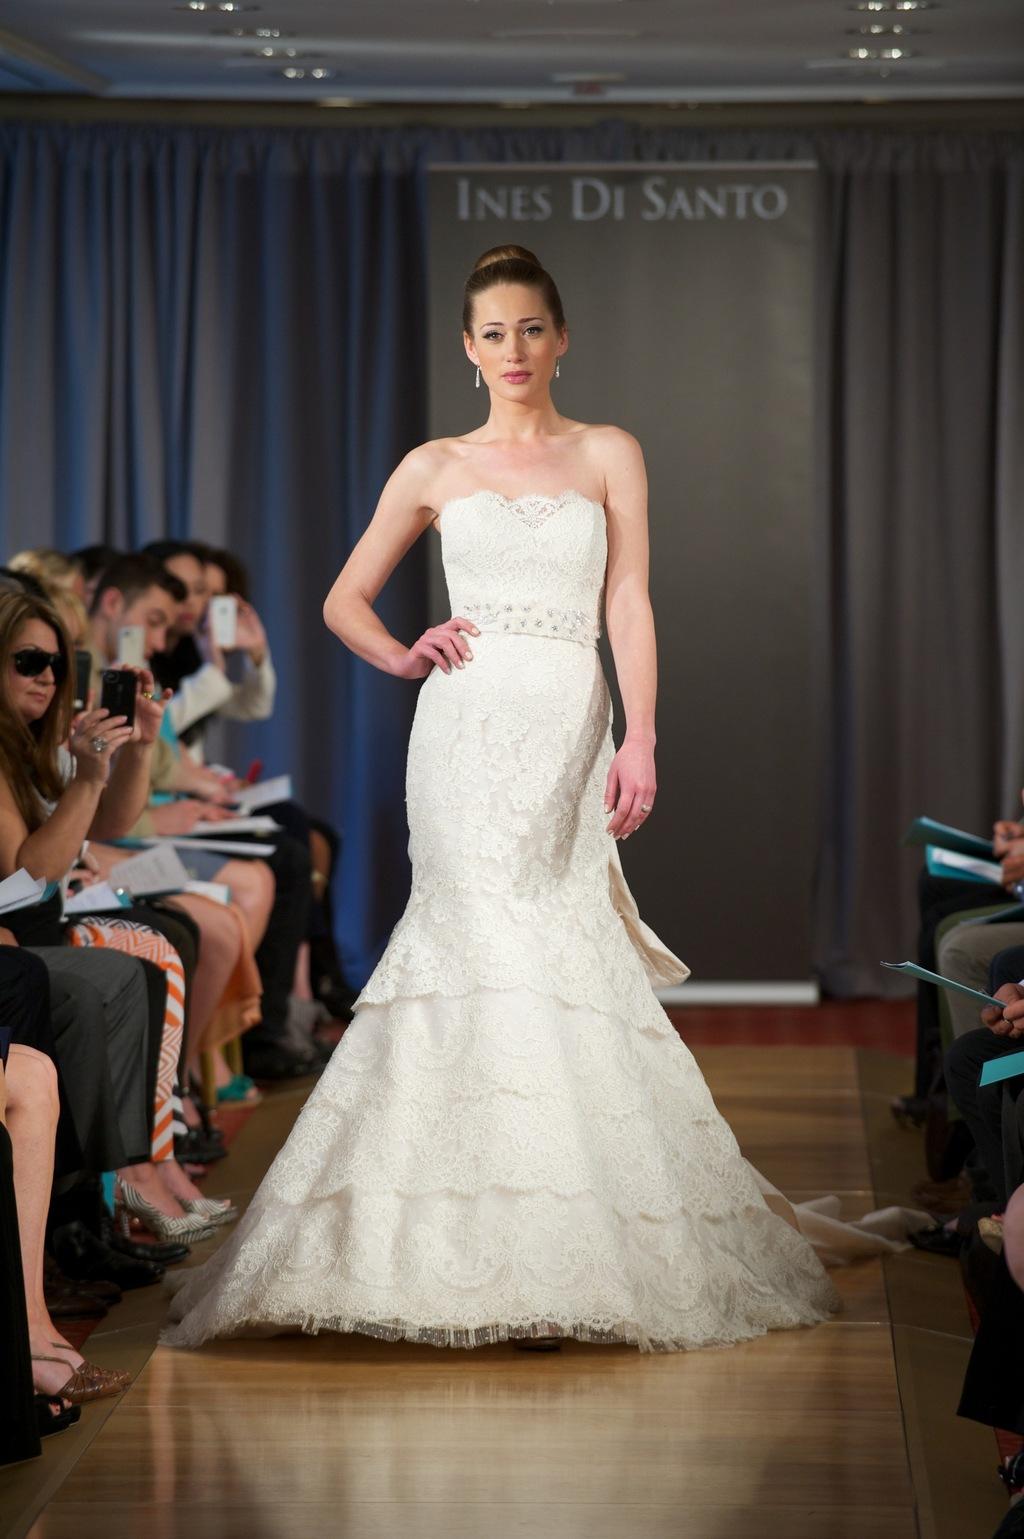 Wedding-dress-spring-2013-bridal-gowns-ines-di-santo-10.full